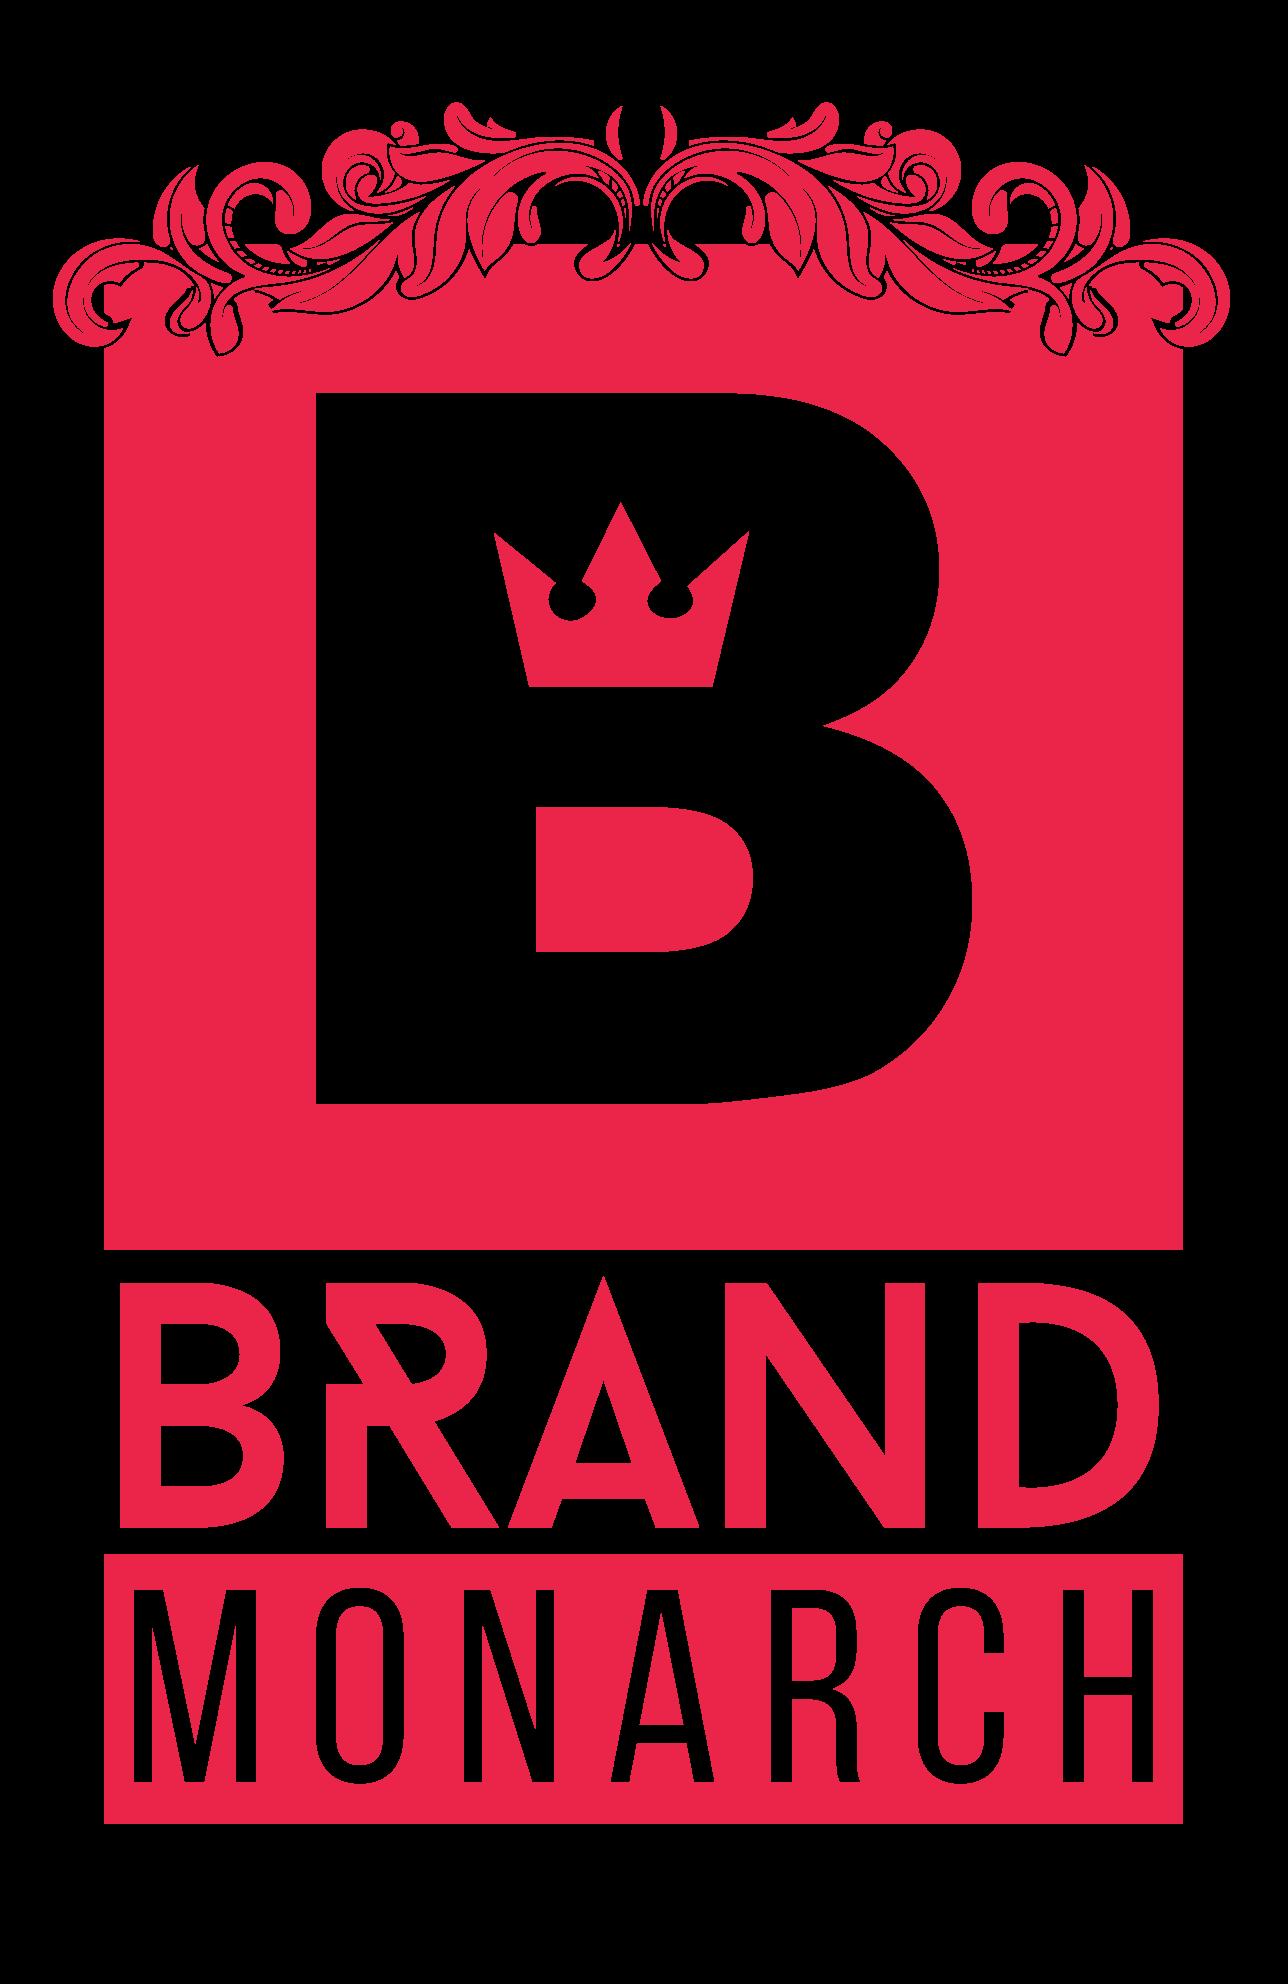 Brand Monarch Ltd